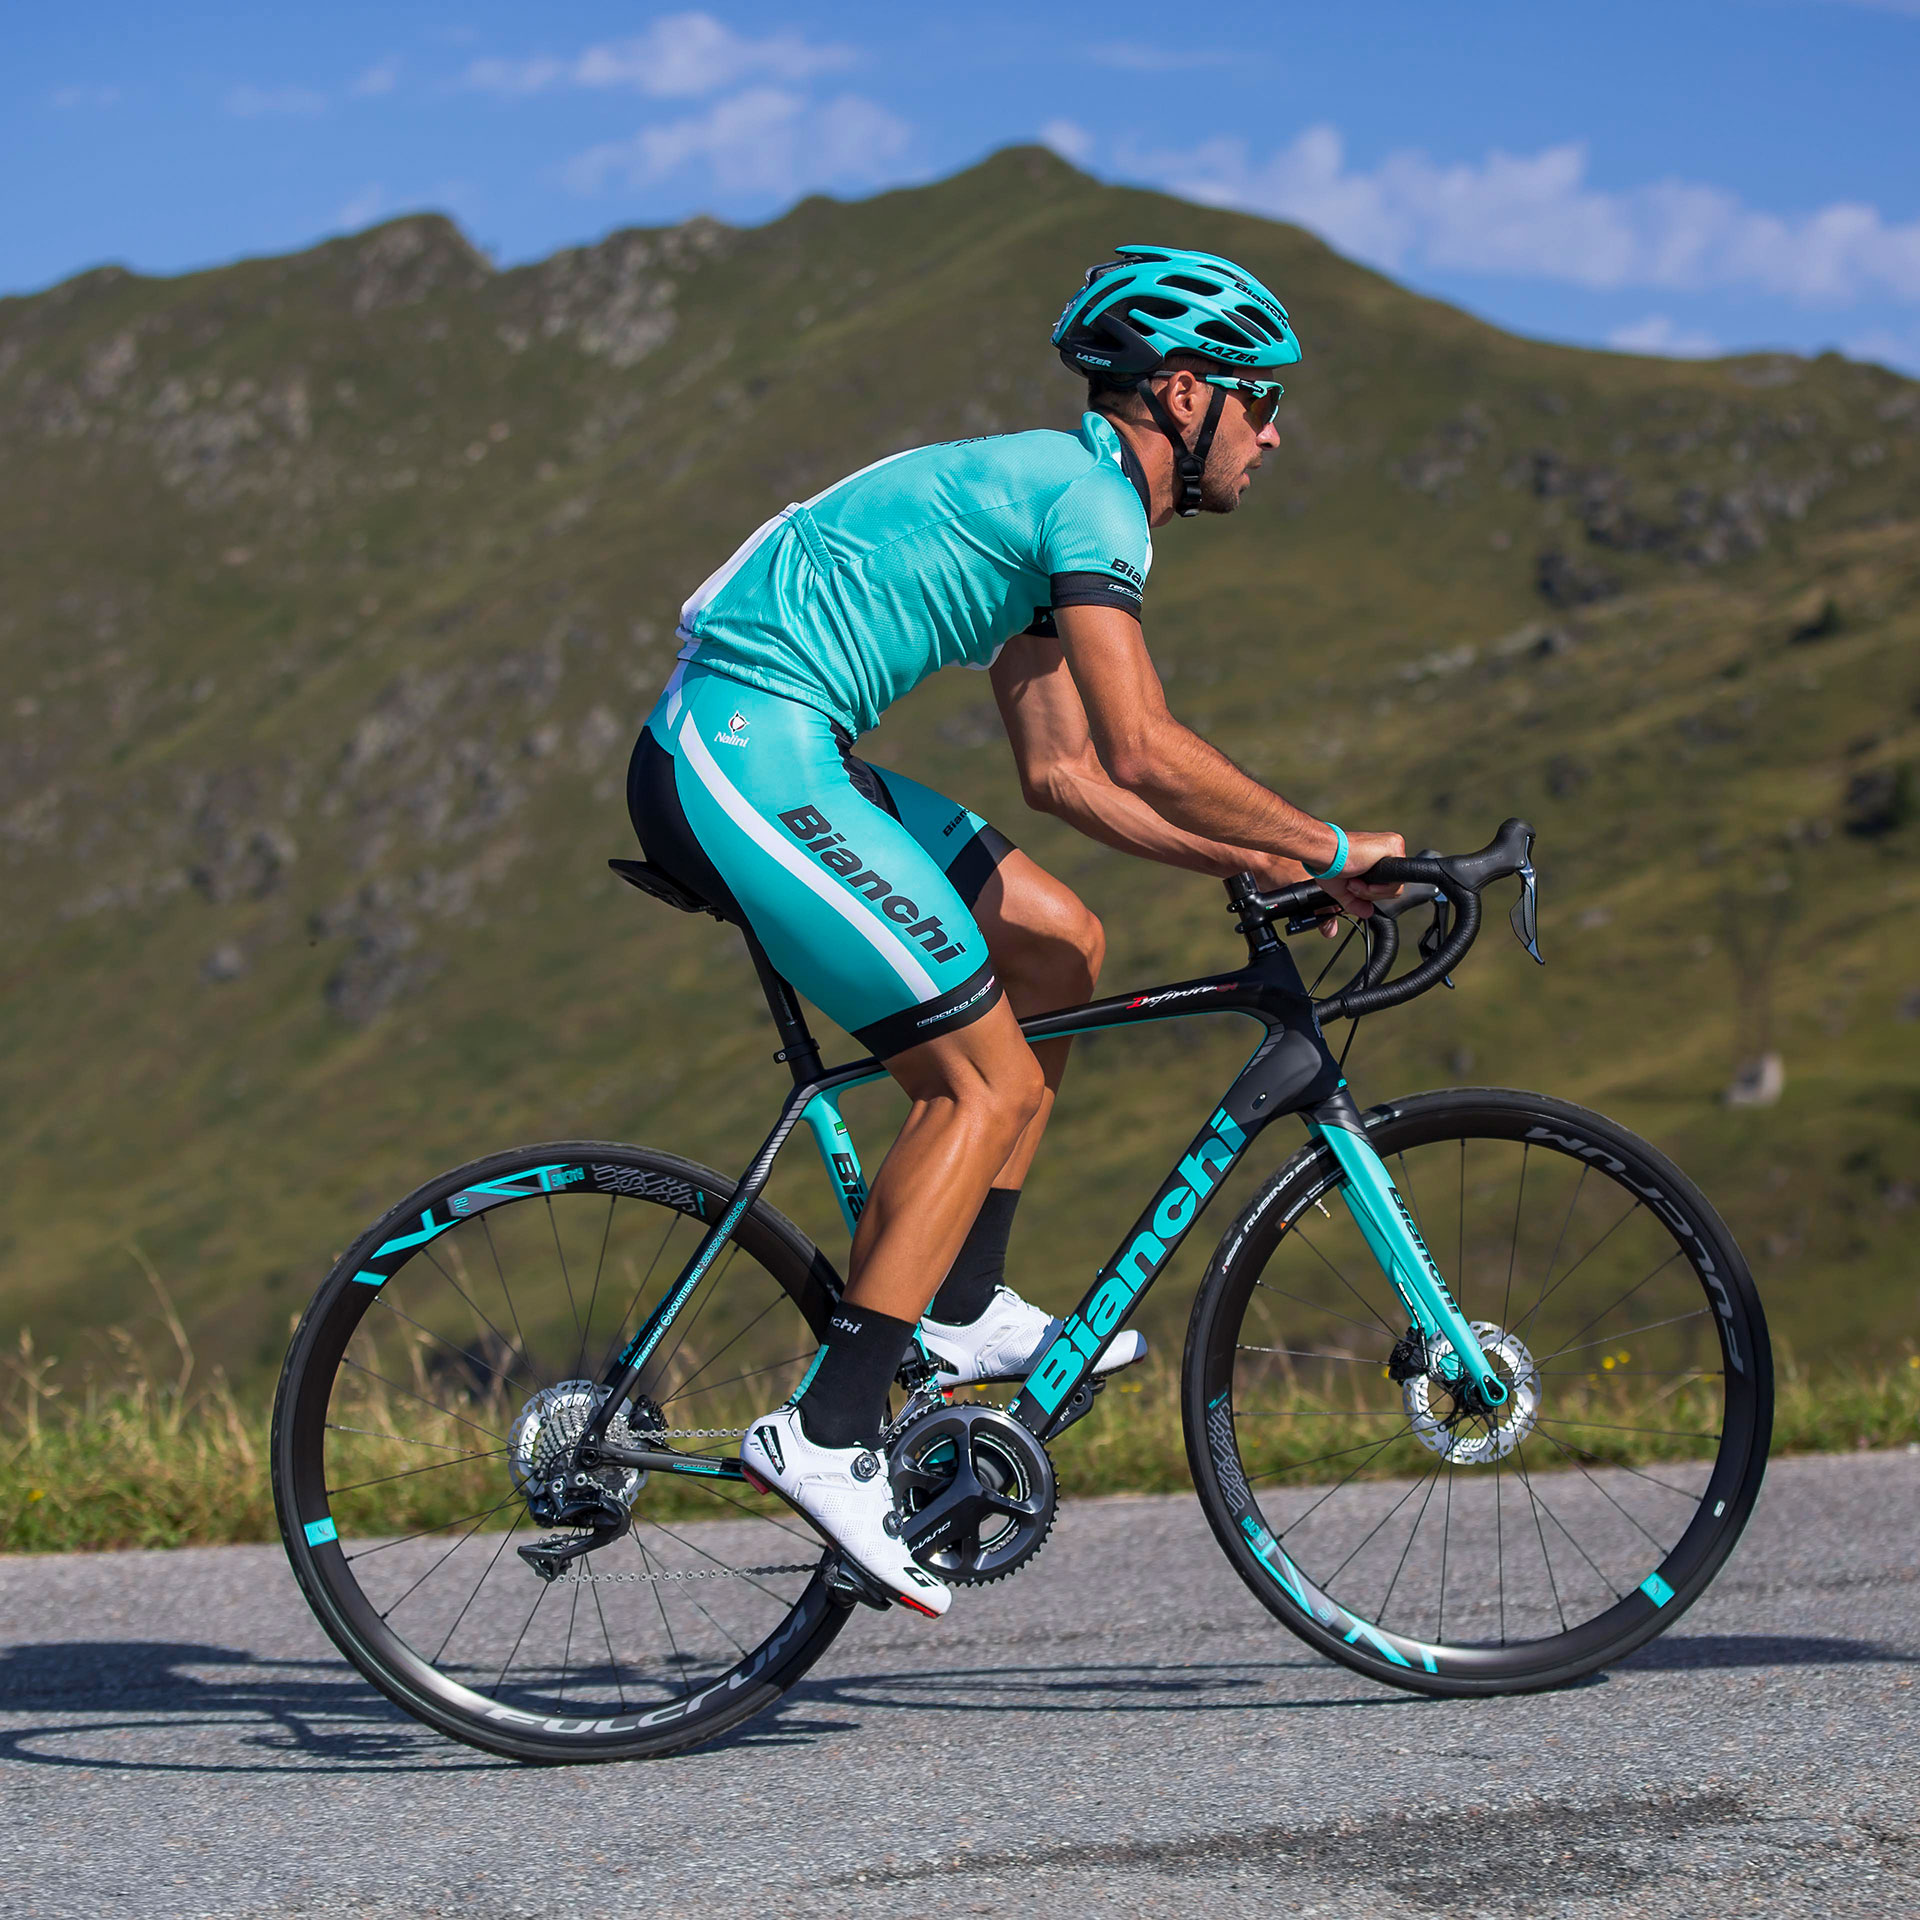 Bianchi Infinito CV Road Bike